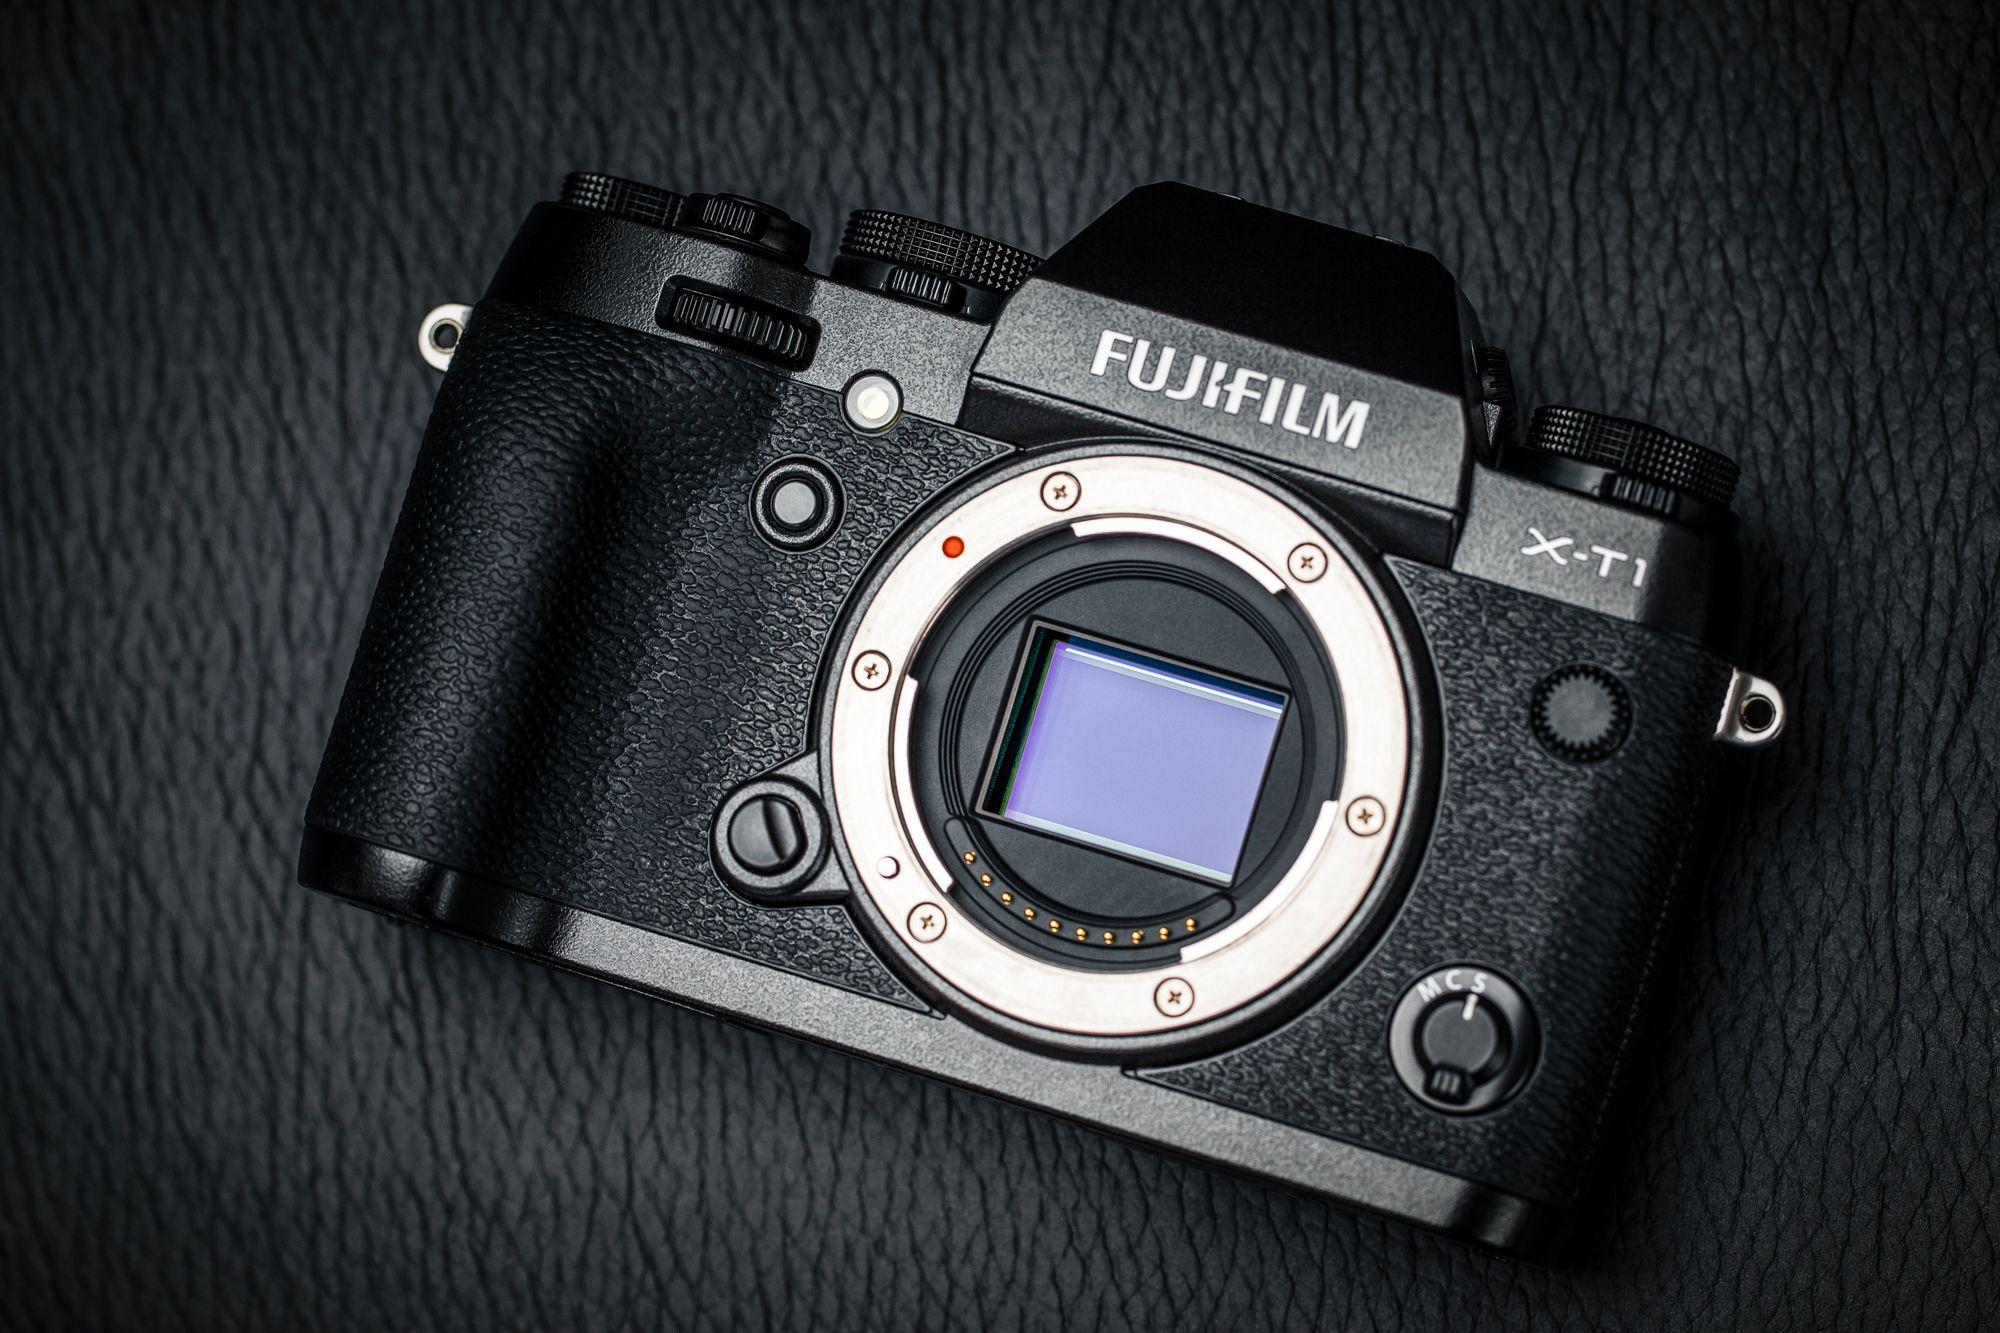 Fujifilm X-T1s X-Trans CMOS II. (Foto: Johannes Granseth)